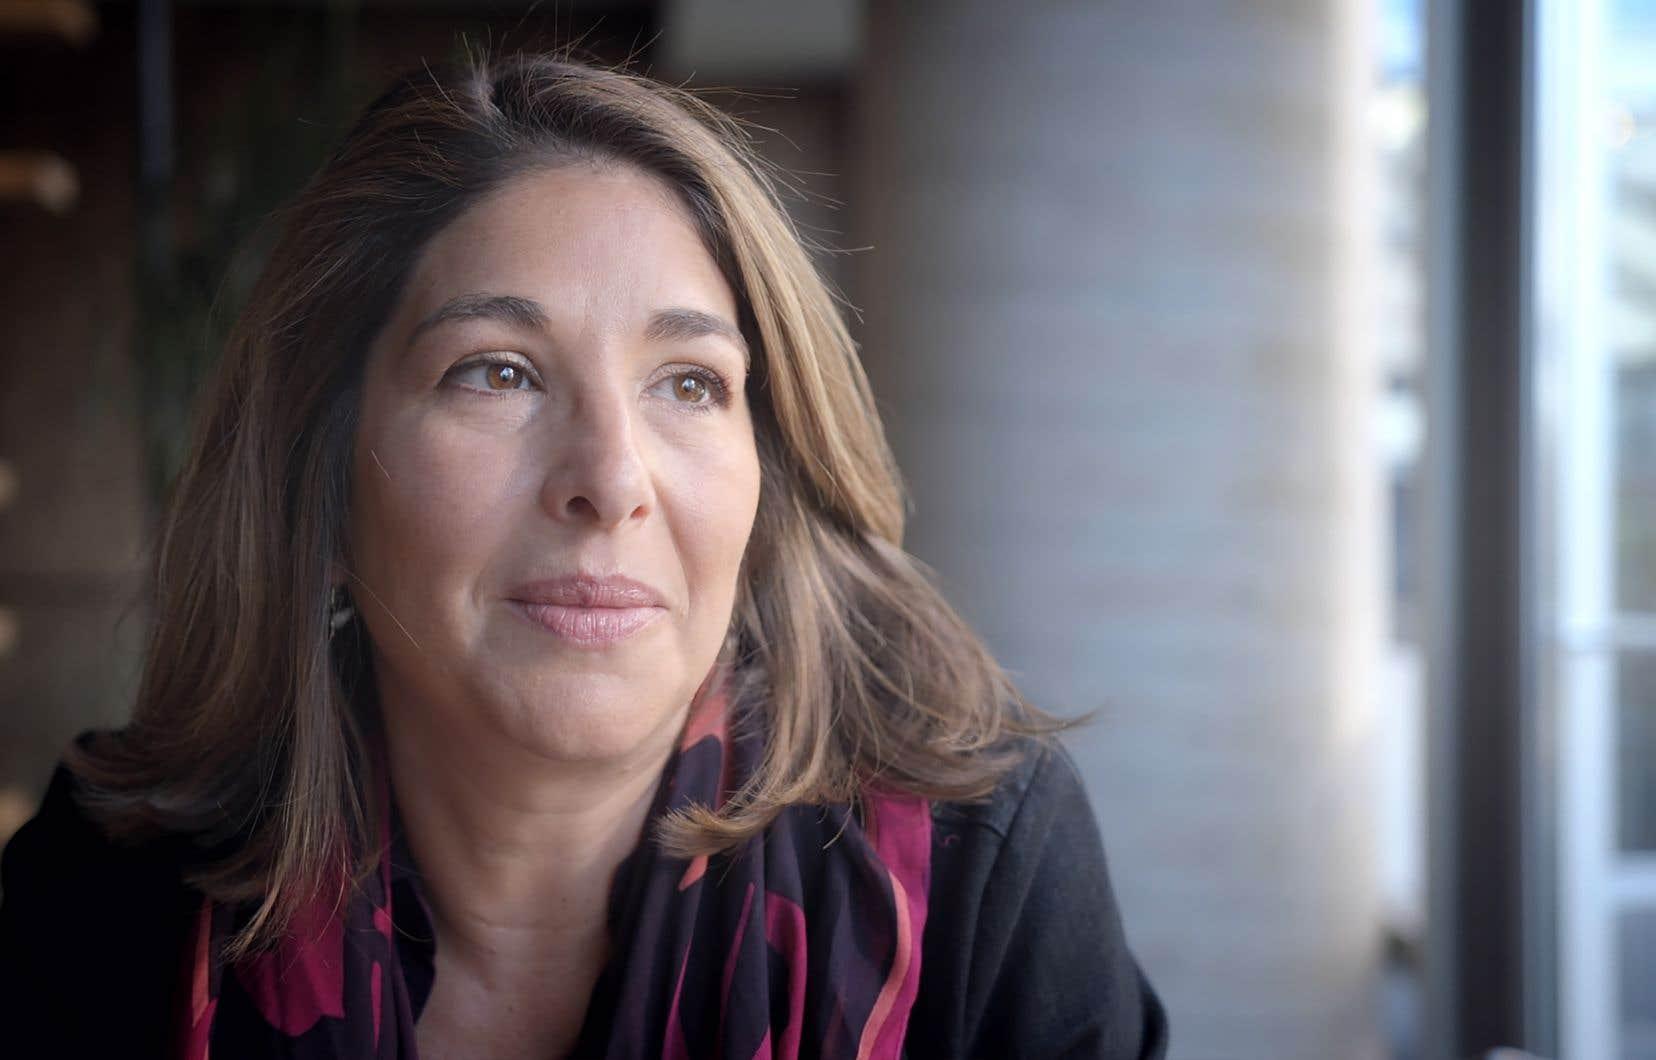 La journaliste et militante canadienne Naomi Klein